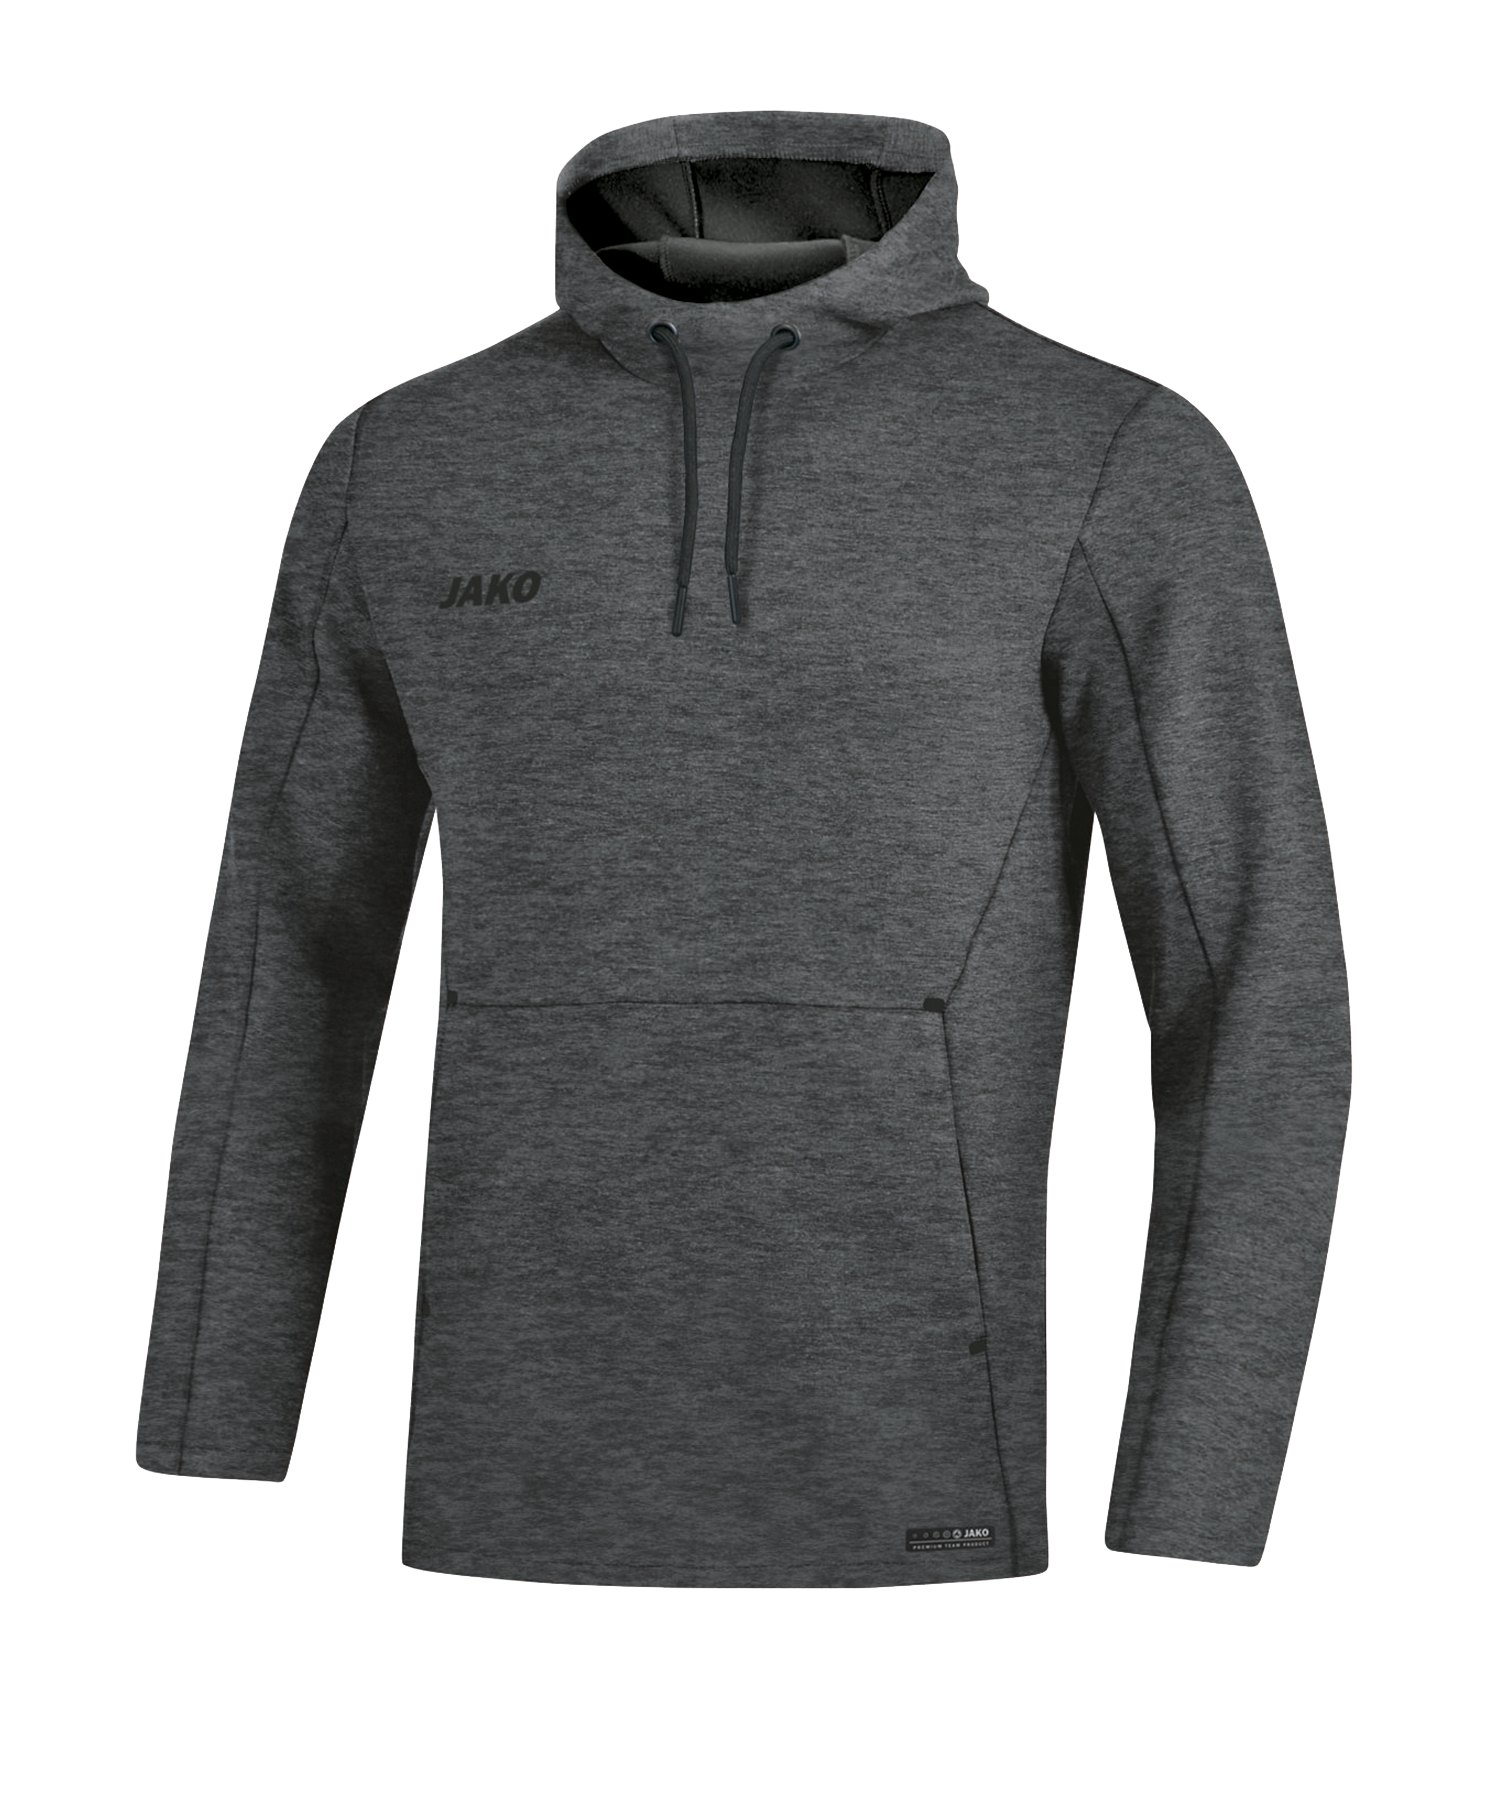 Jako Premium Basic Hoody Damen Grau F21 - grau